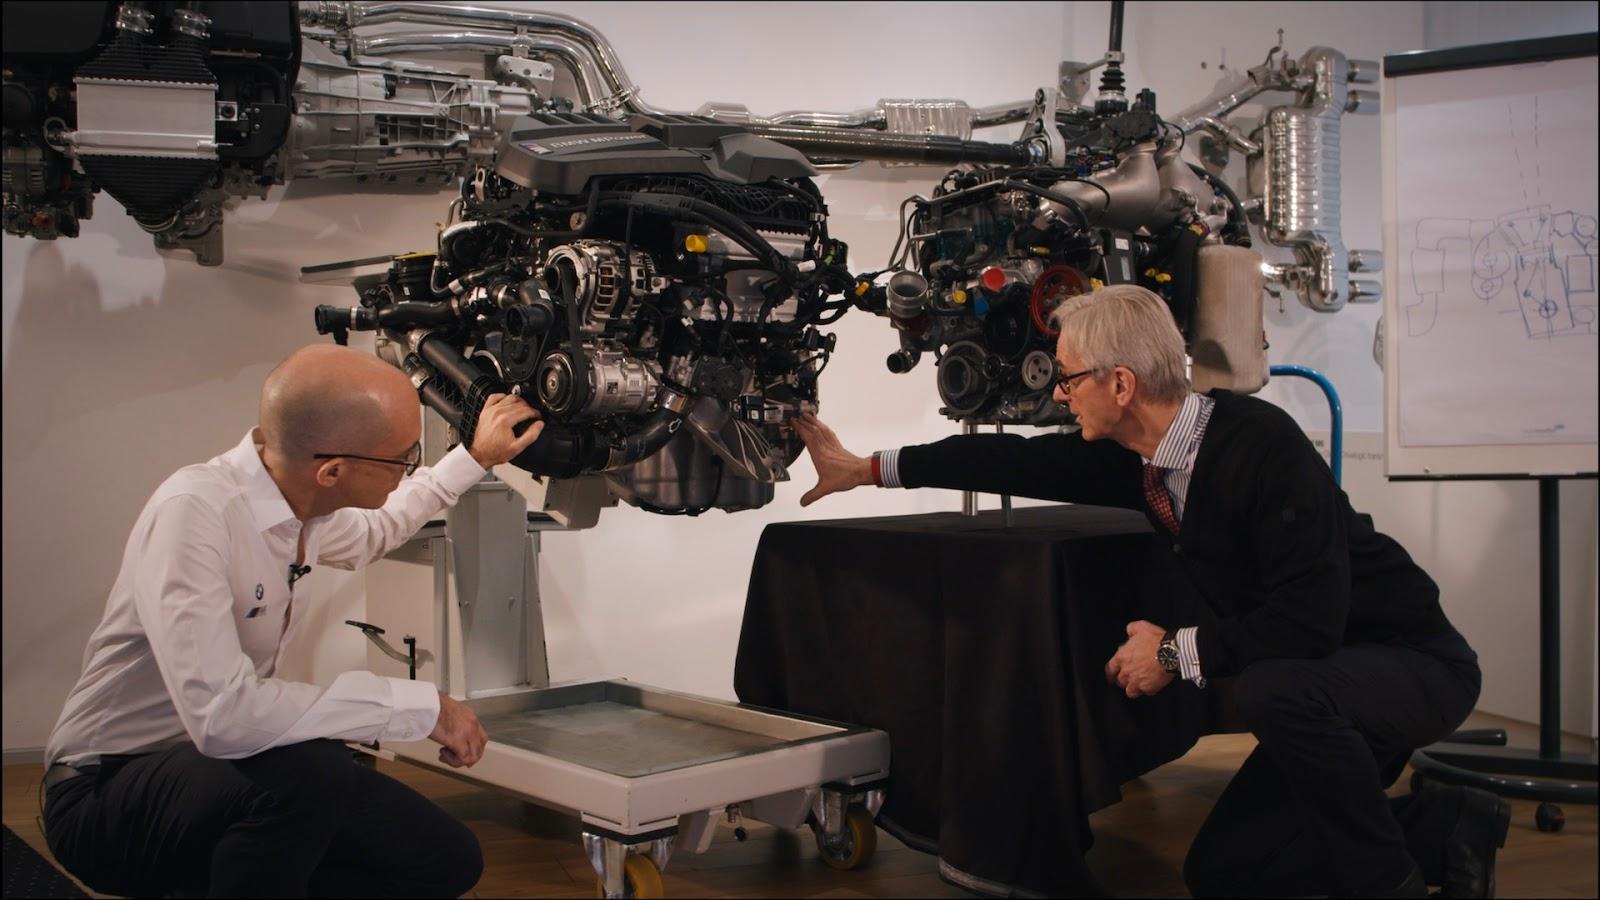 P90418592 highRes the bmw m4 meets the 1 Περί κινητήρων BMW M : Η M4 συναντά την M4 GT3 (video) BMW, BMW M, BMW M Performance, BMW M4, M, M4, ειδήσεις